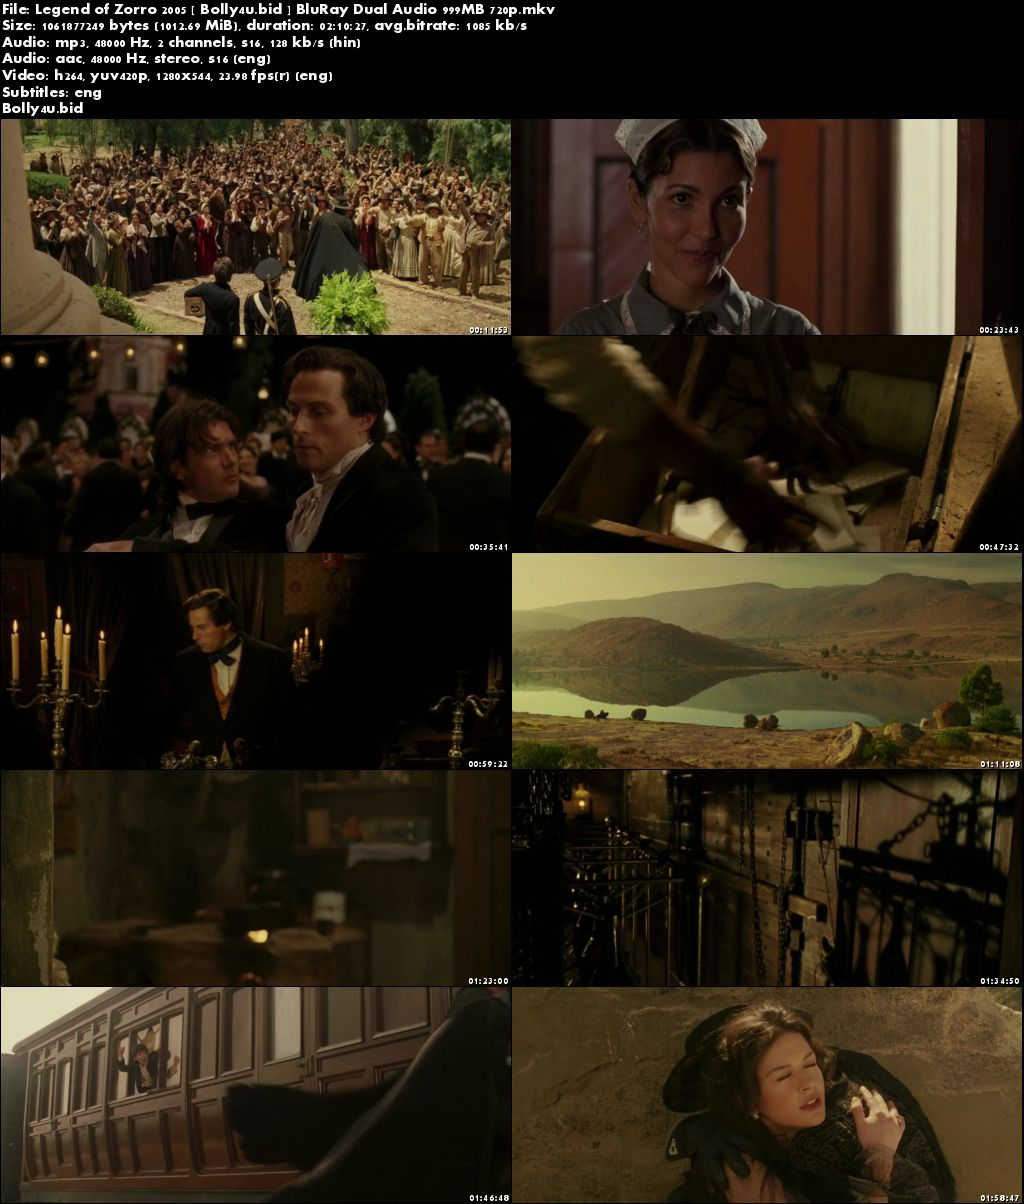 Legend of Zorro 2005 Hindi Dual Audio BluRay 720p Download